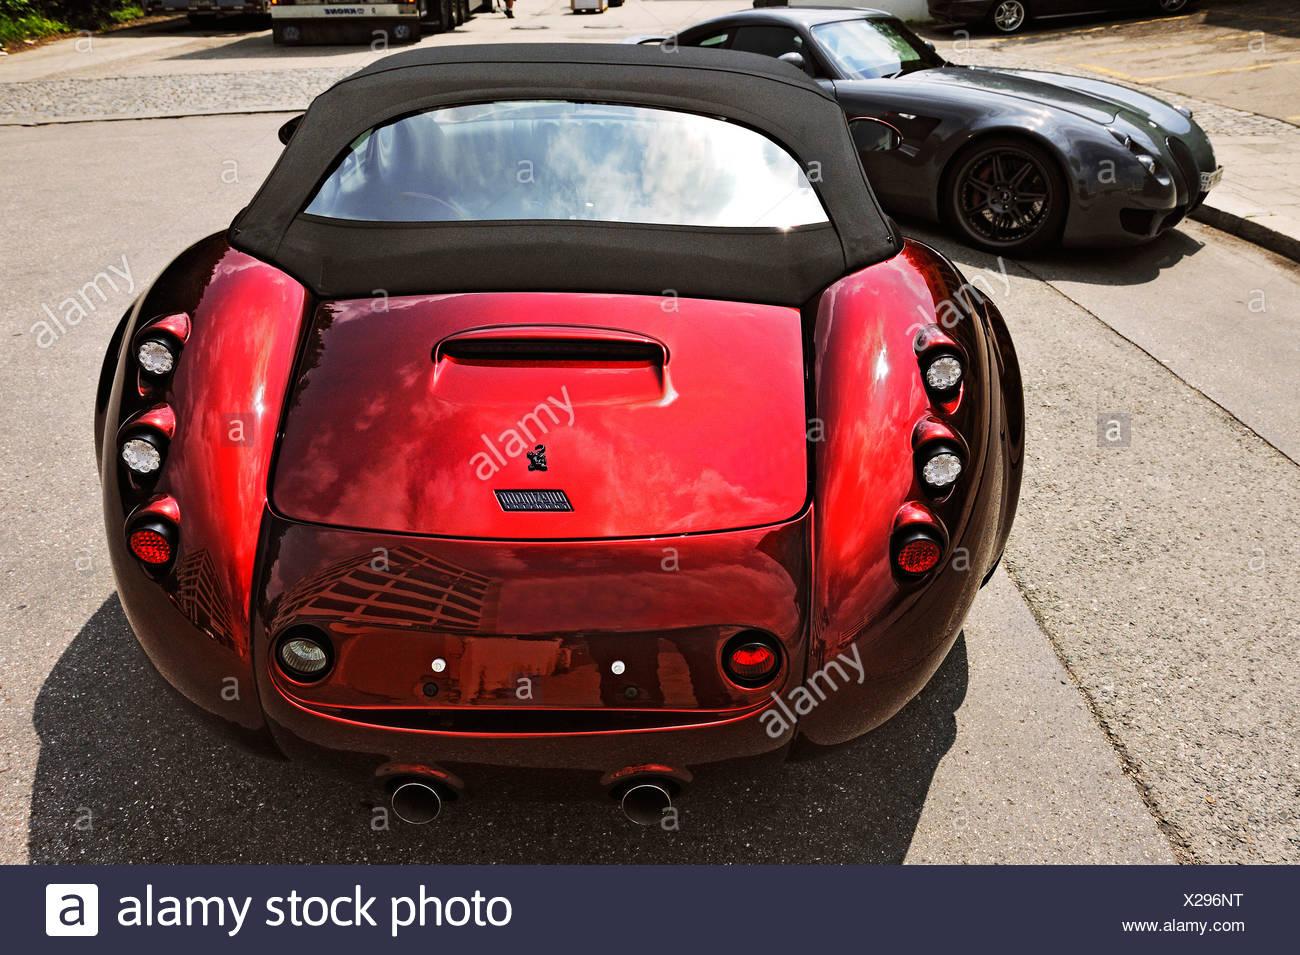 Wiesmann sports car, roadster, Munich, Bavaria, Germany, Europe - Stock Image